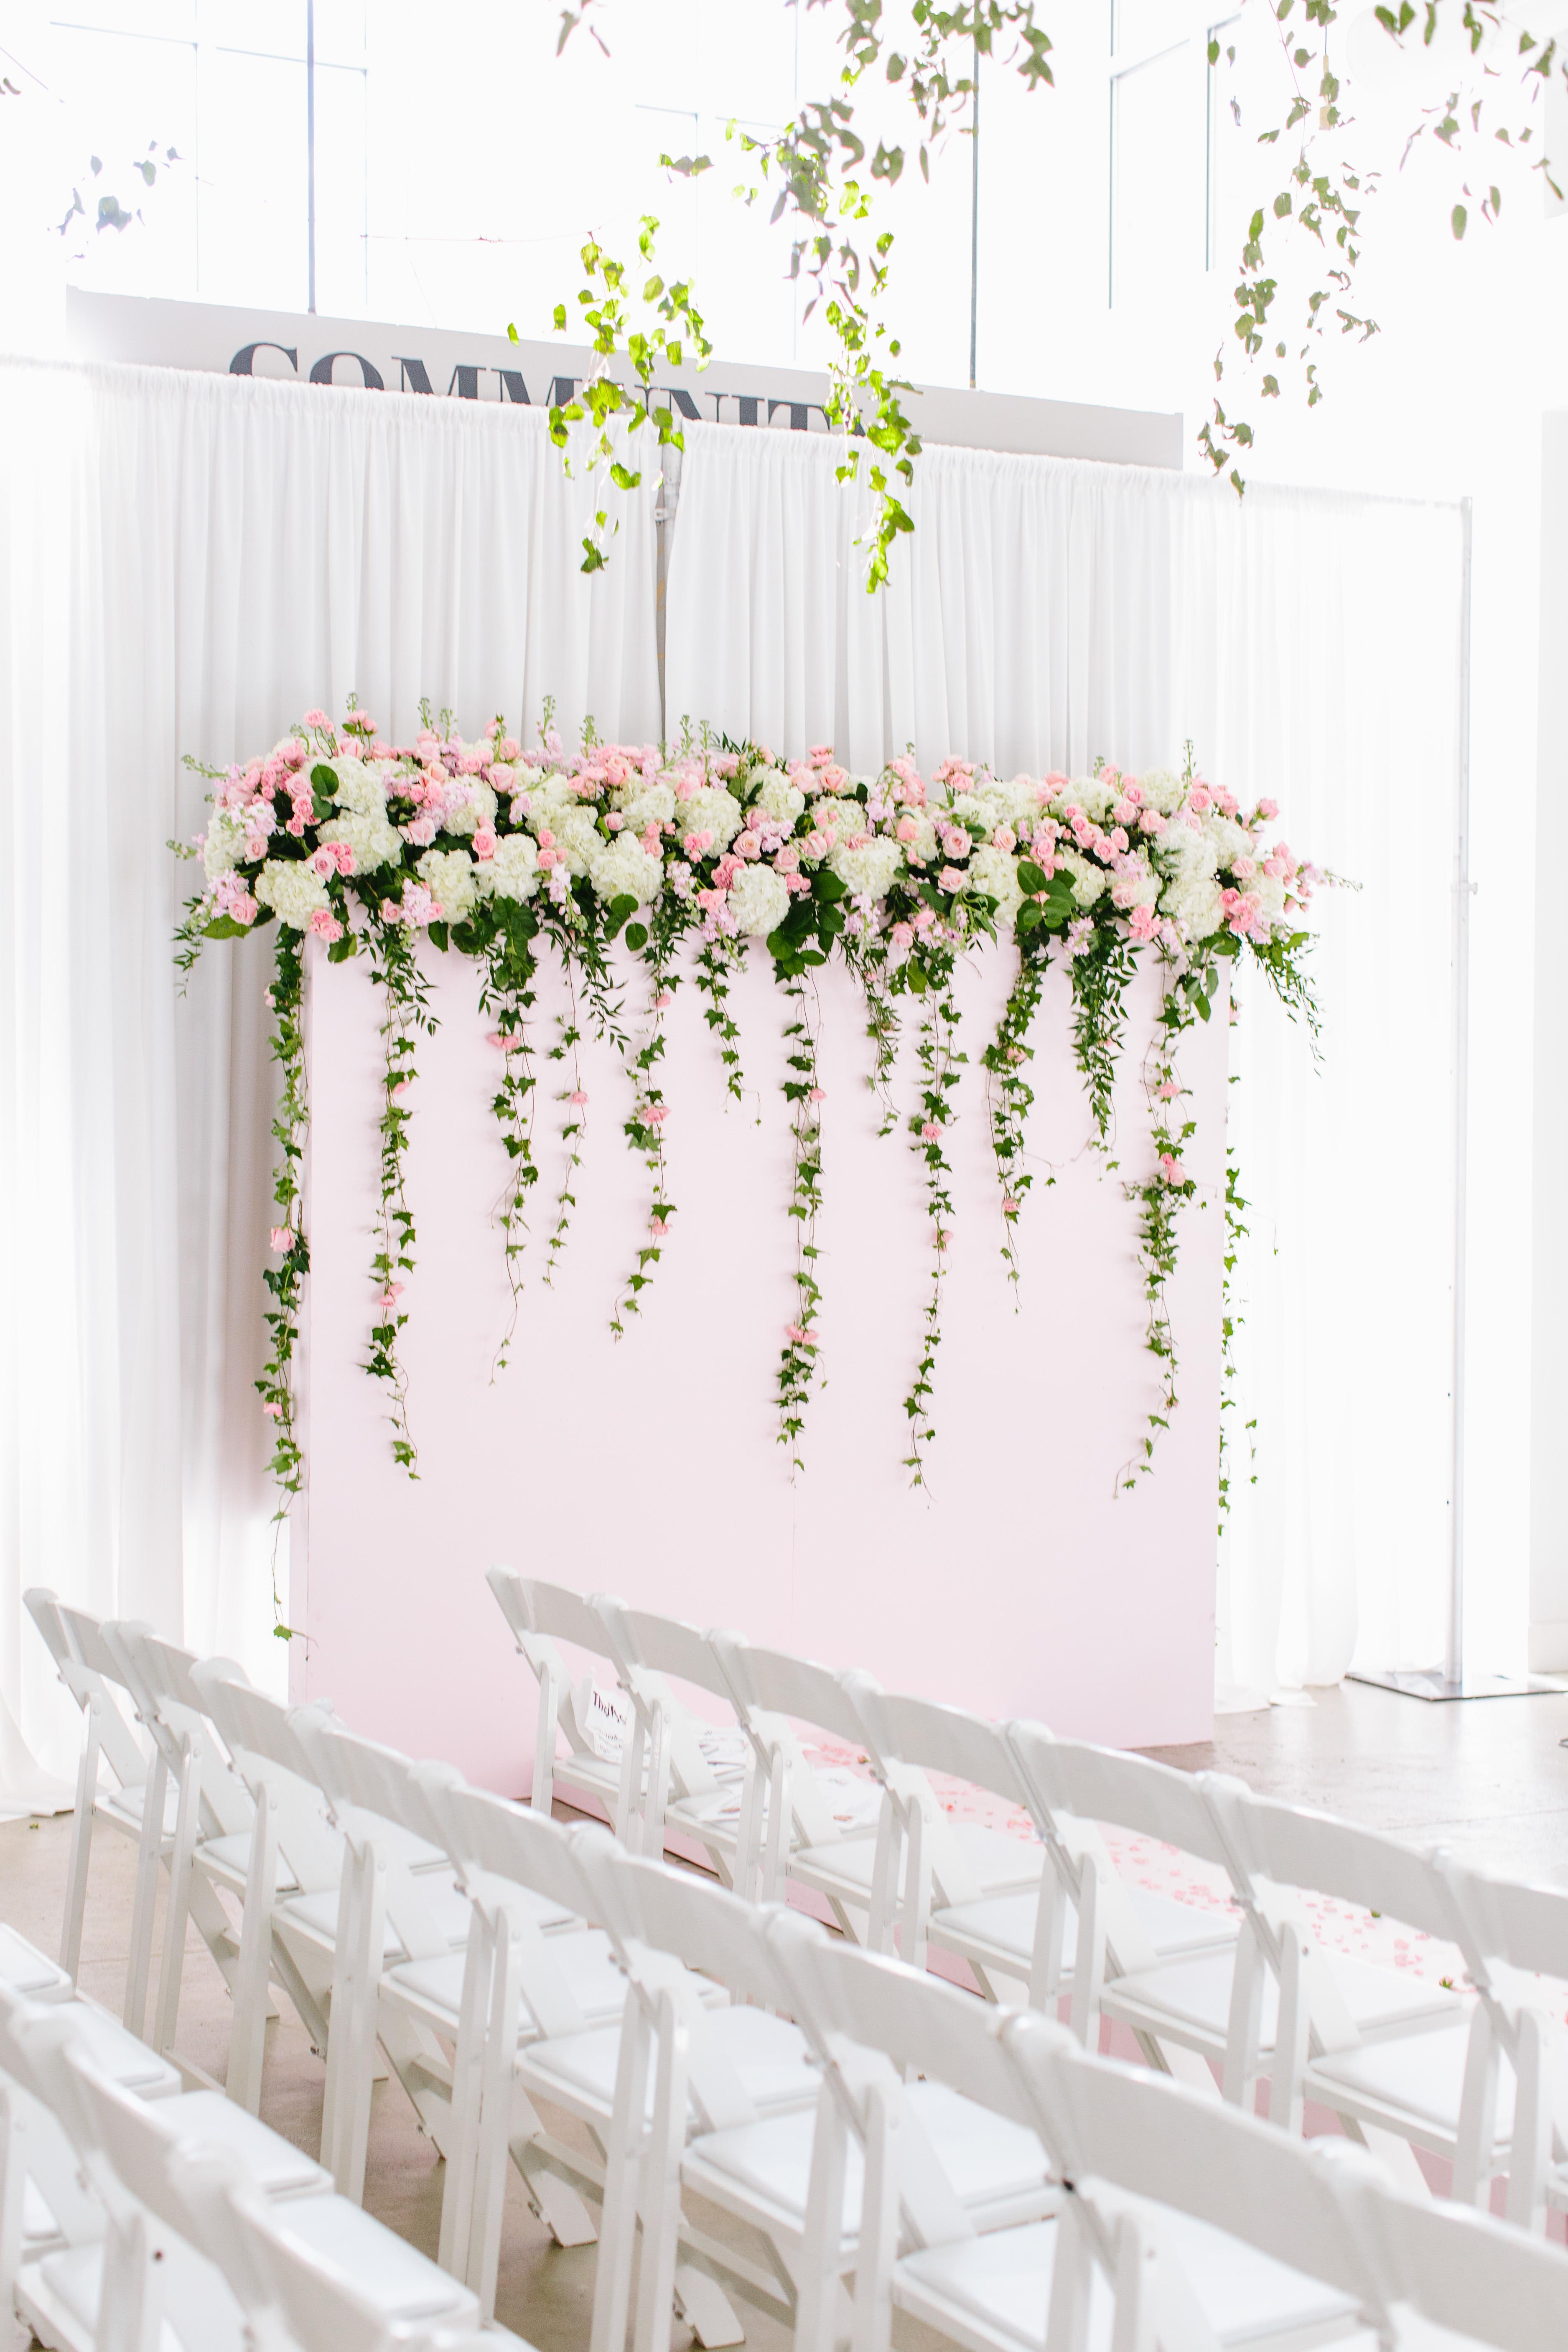 Flower Wall Runway - Little Pearls On The Runway - Selah Bea - Engaged Studio Asheville